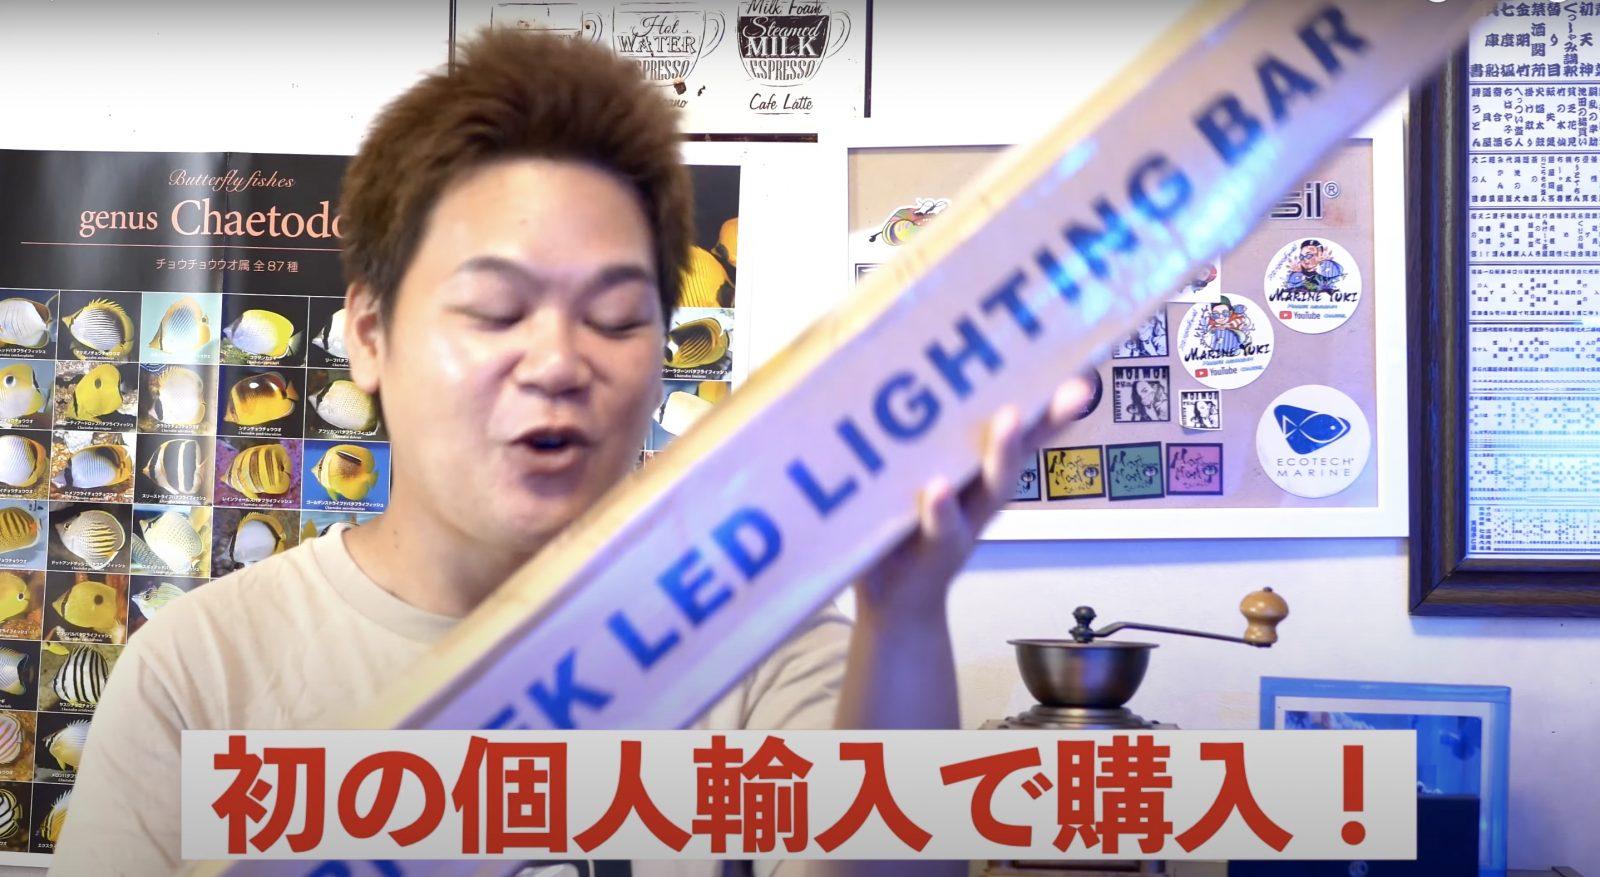 Takumi mit unserer OR3 LED-Leiste